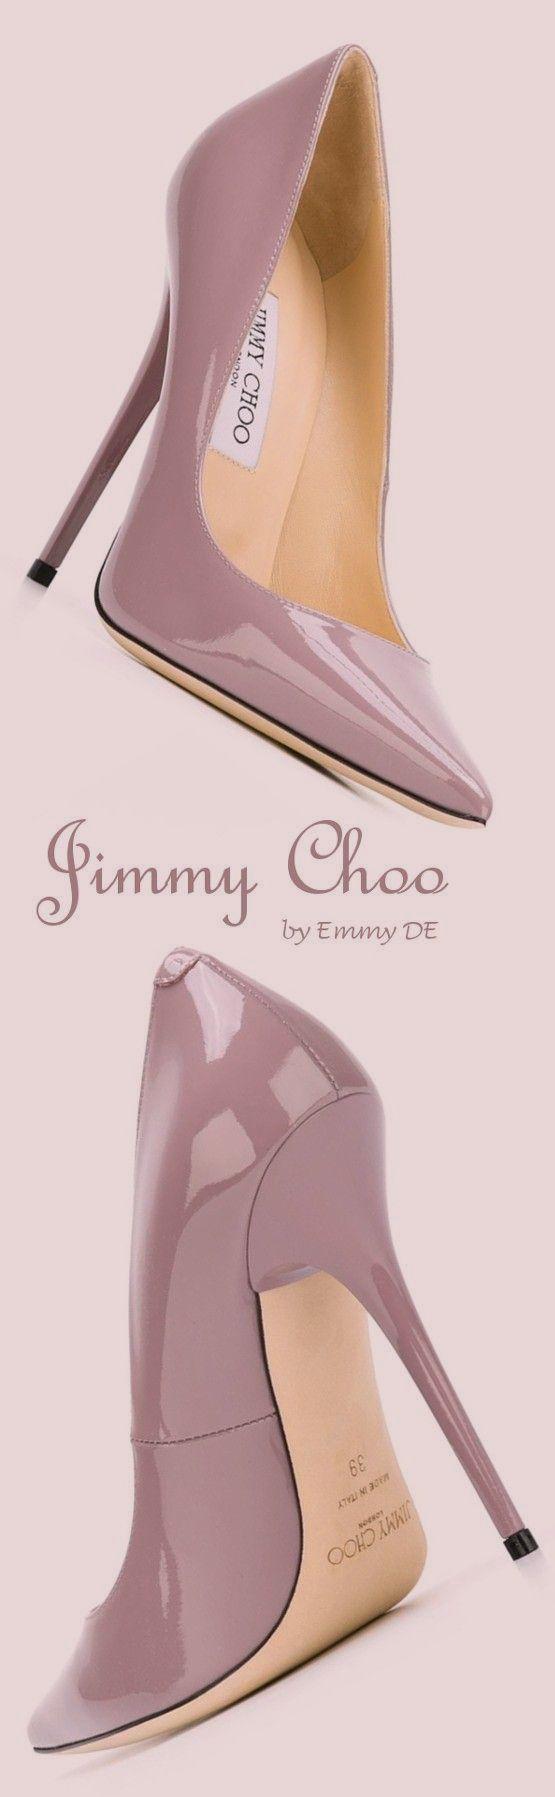 Jimmy Choo | House of Beccaria~. Via @tcorbeil1947. #JimmyChoo #heels